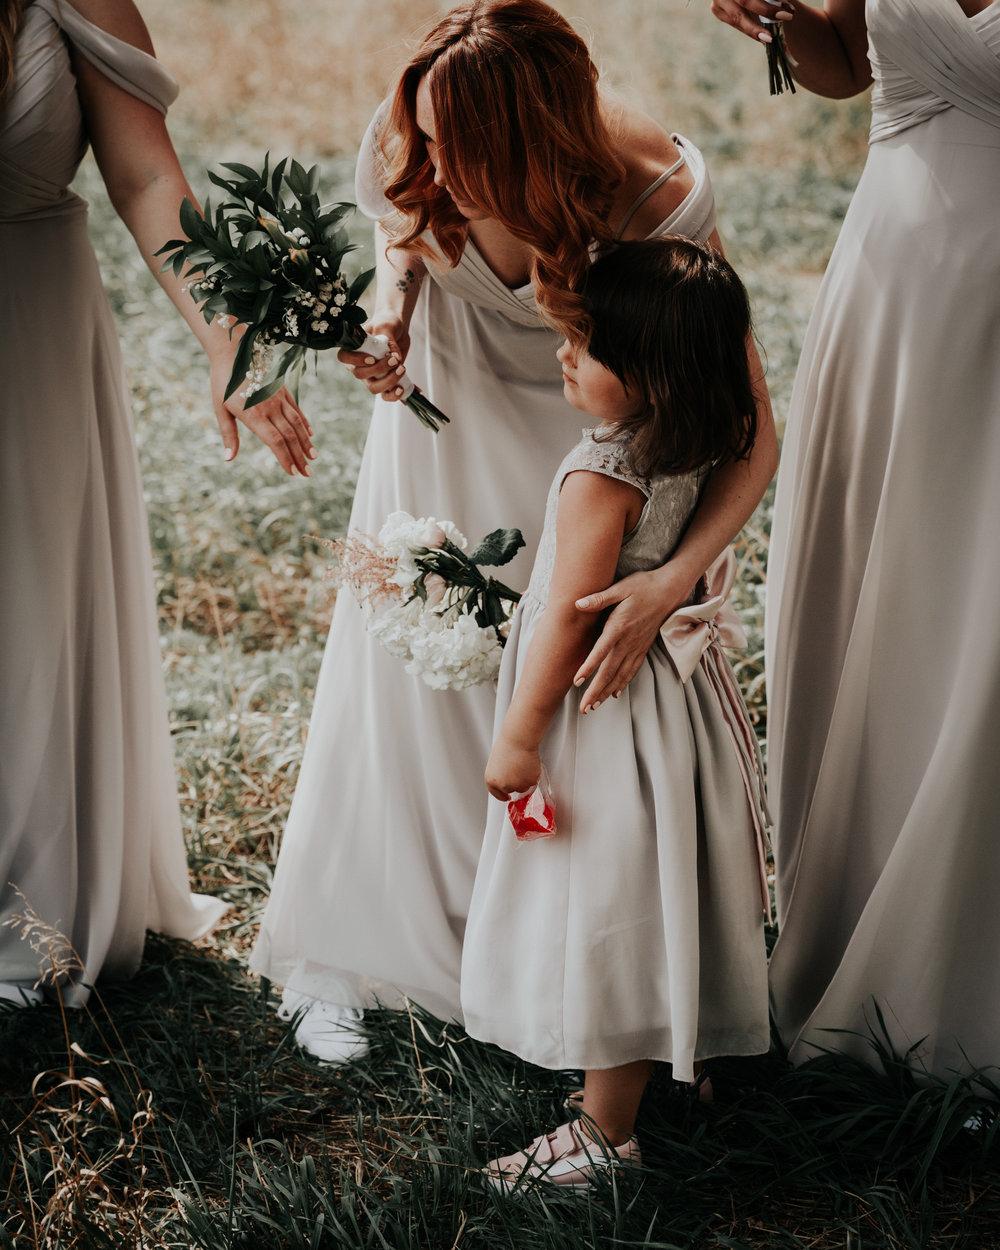 Walters Wedding Favourites - JayRMcDonald (8 of 18).JPG